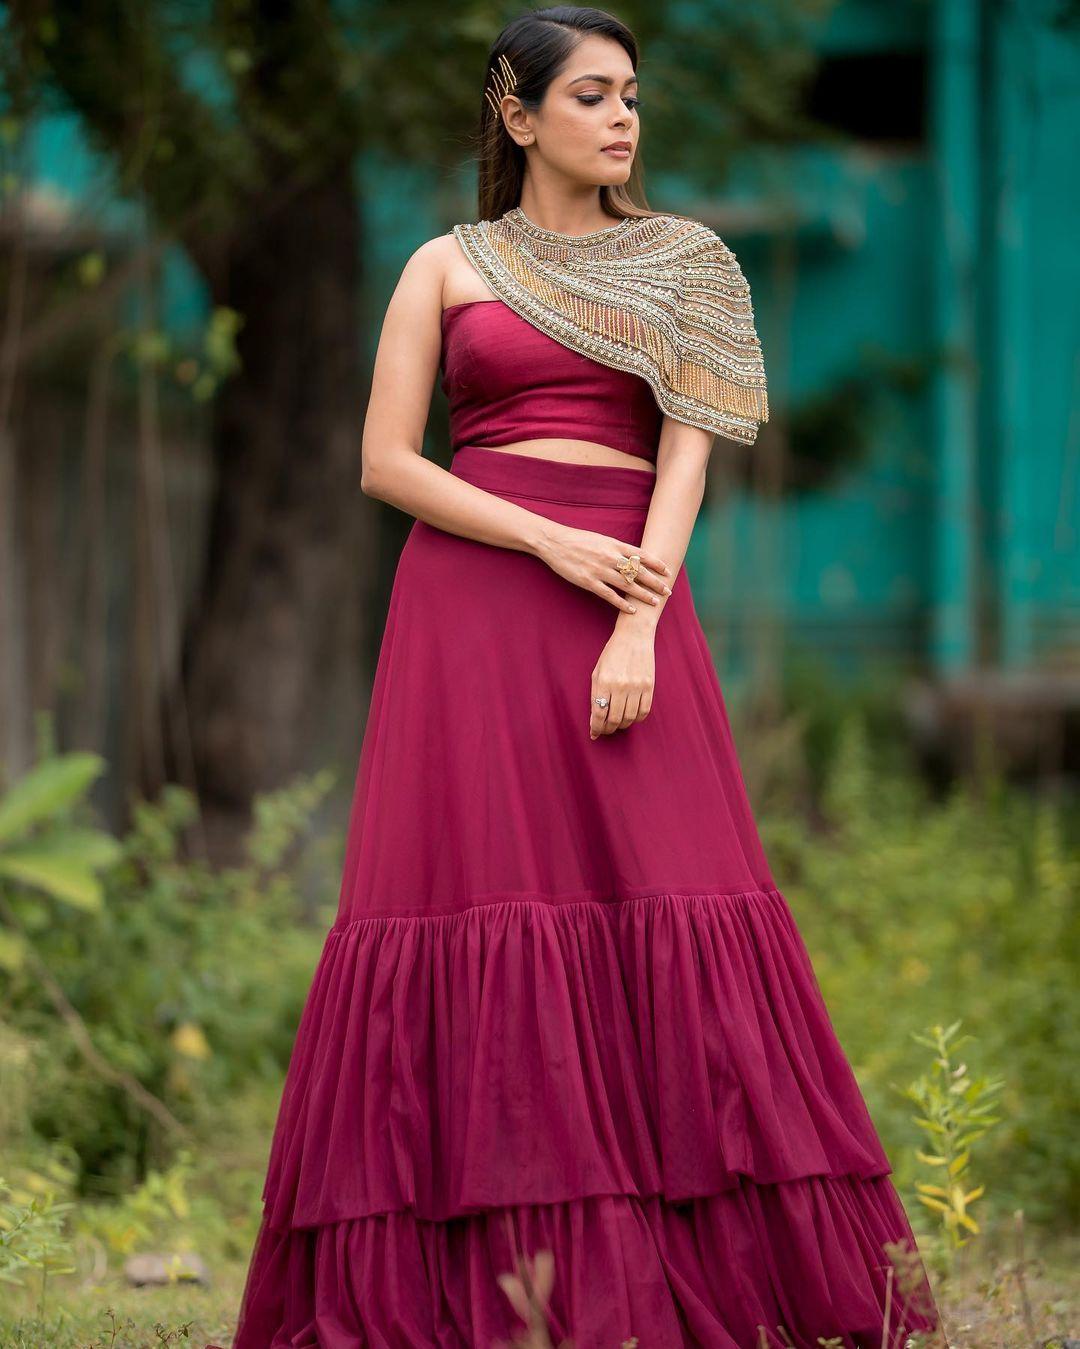 Actress kiki vijay 2020 Latest HD Images